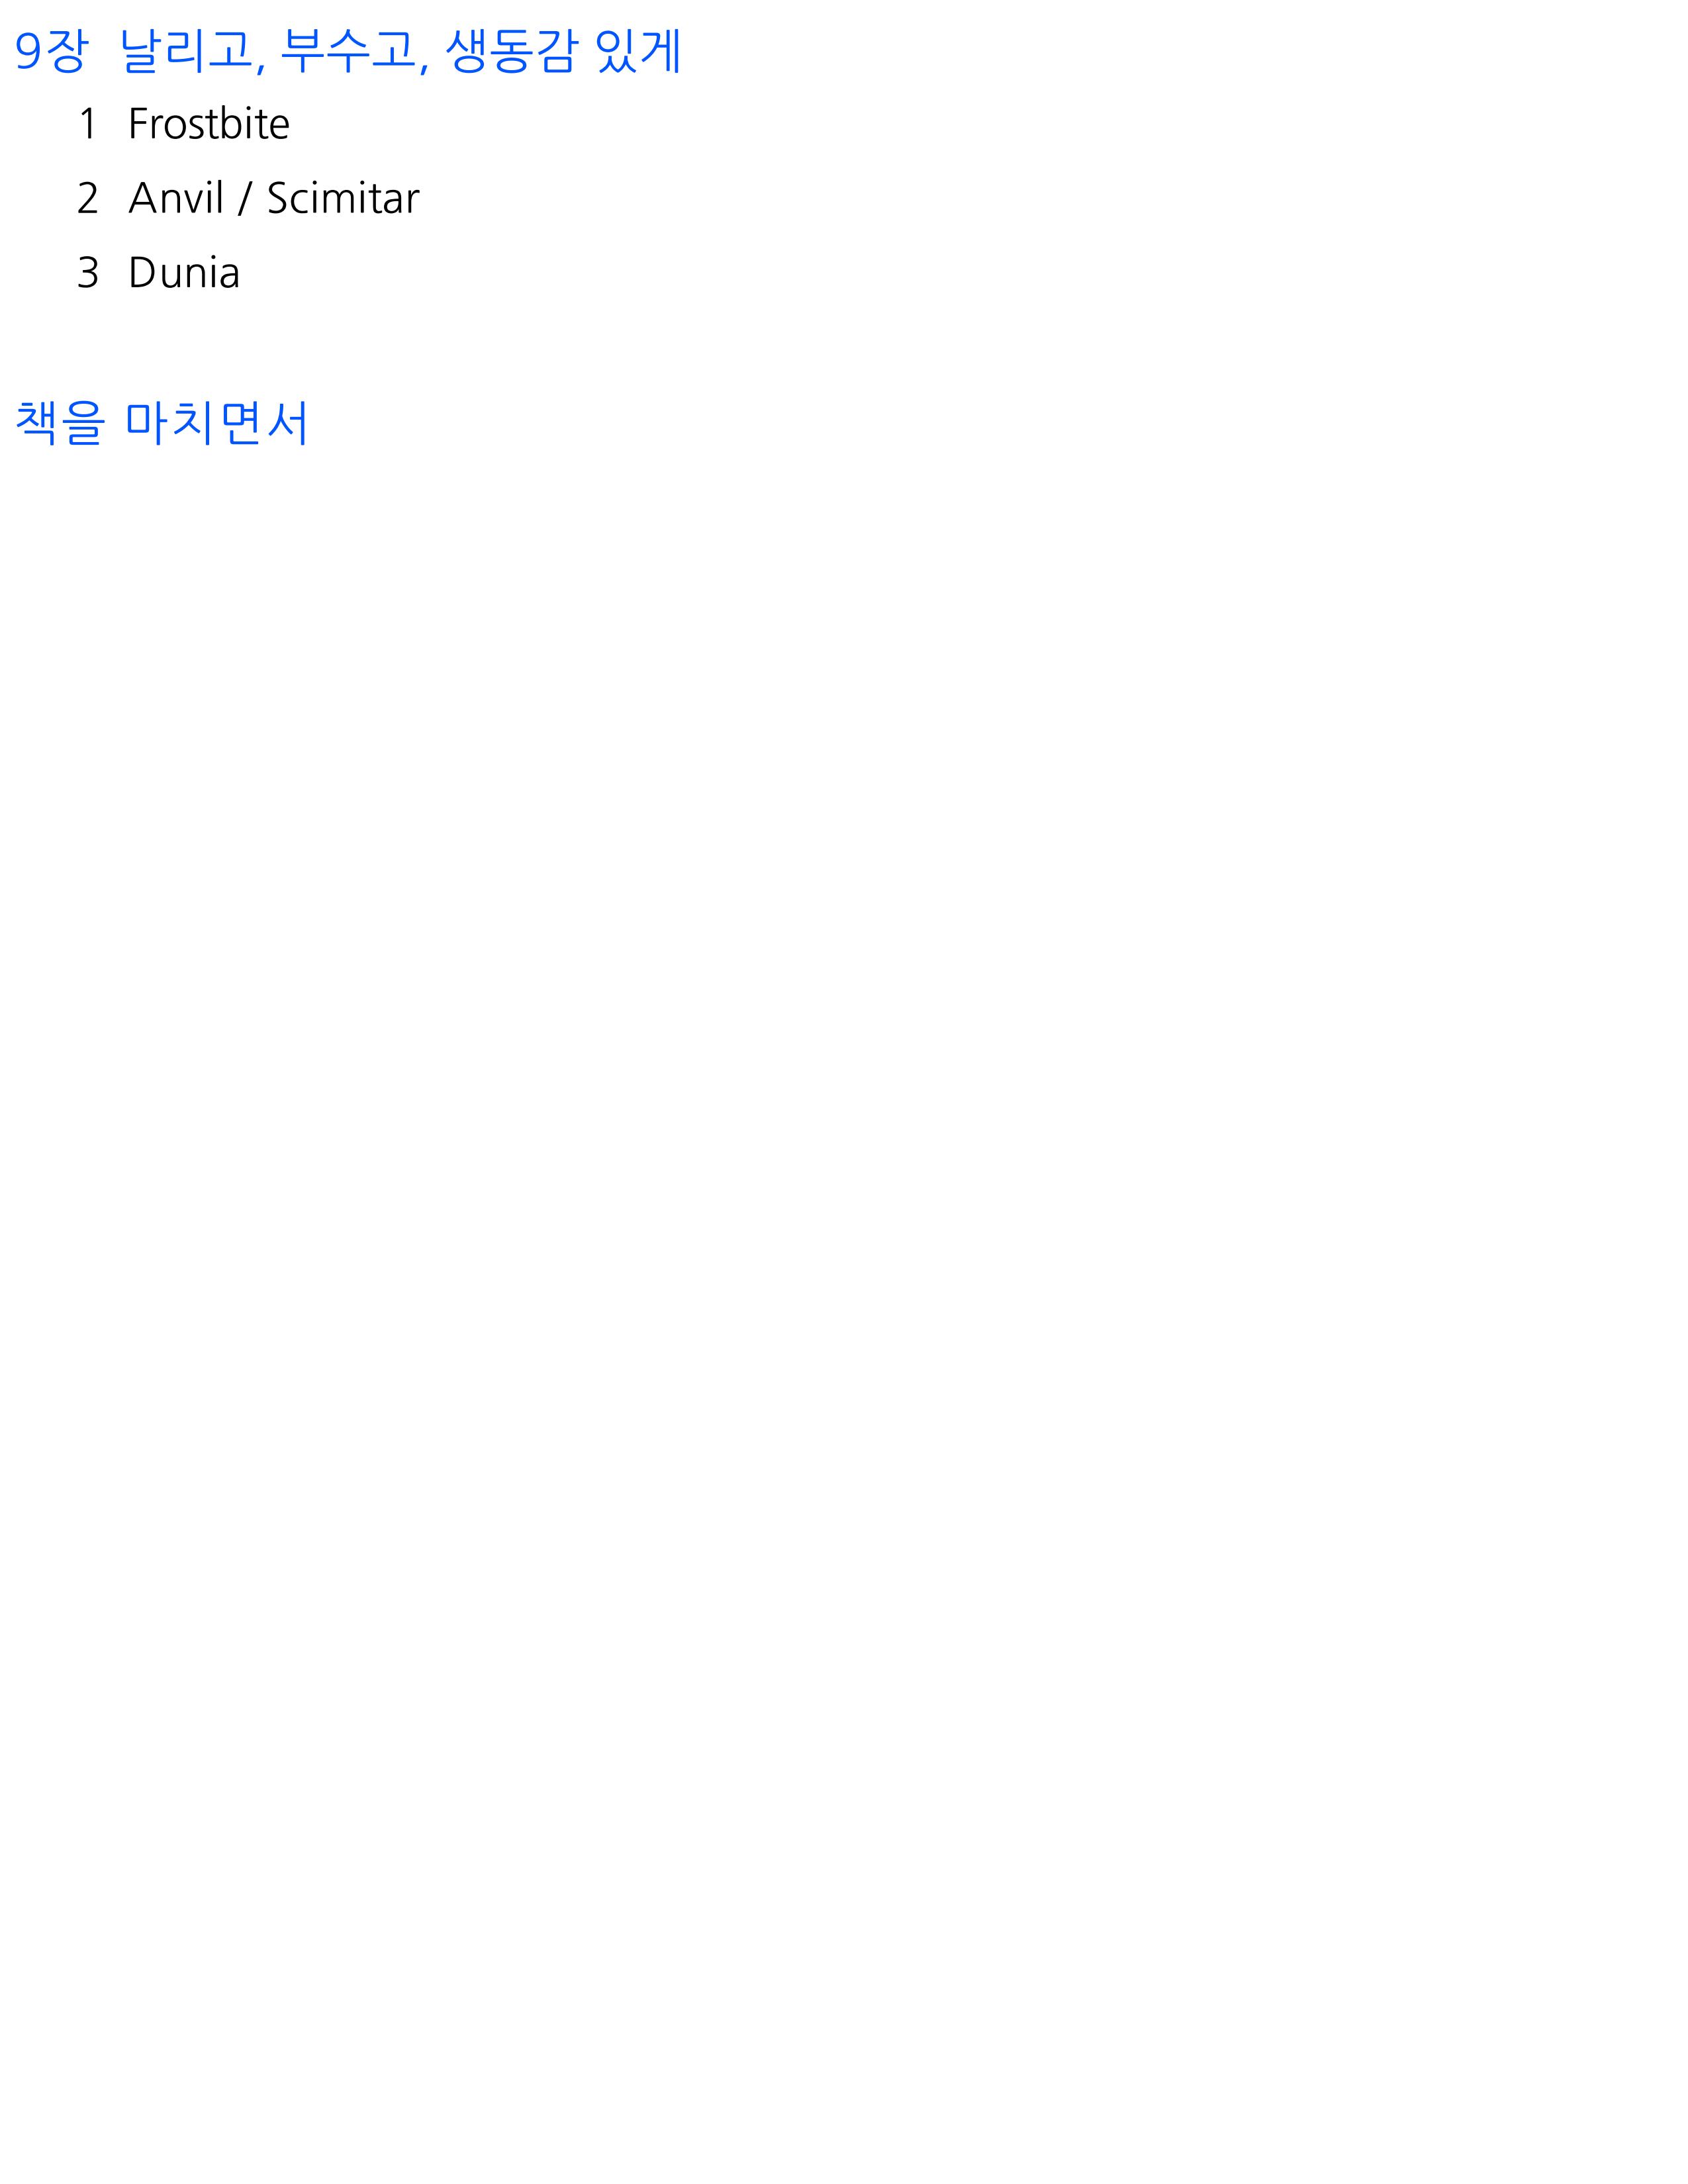 3D geim enjin, eoddeohge baljeo - jeonhyeonseog_05